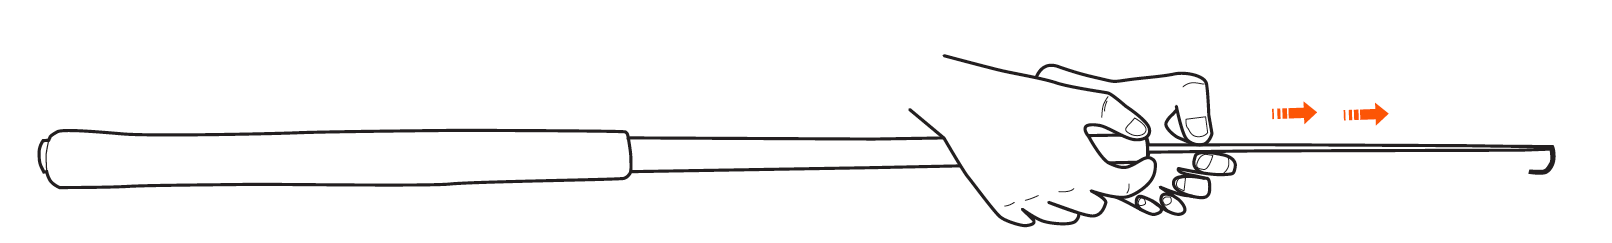 WETFLY Extend Tankara Rod